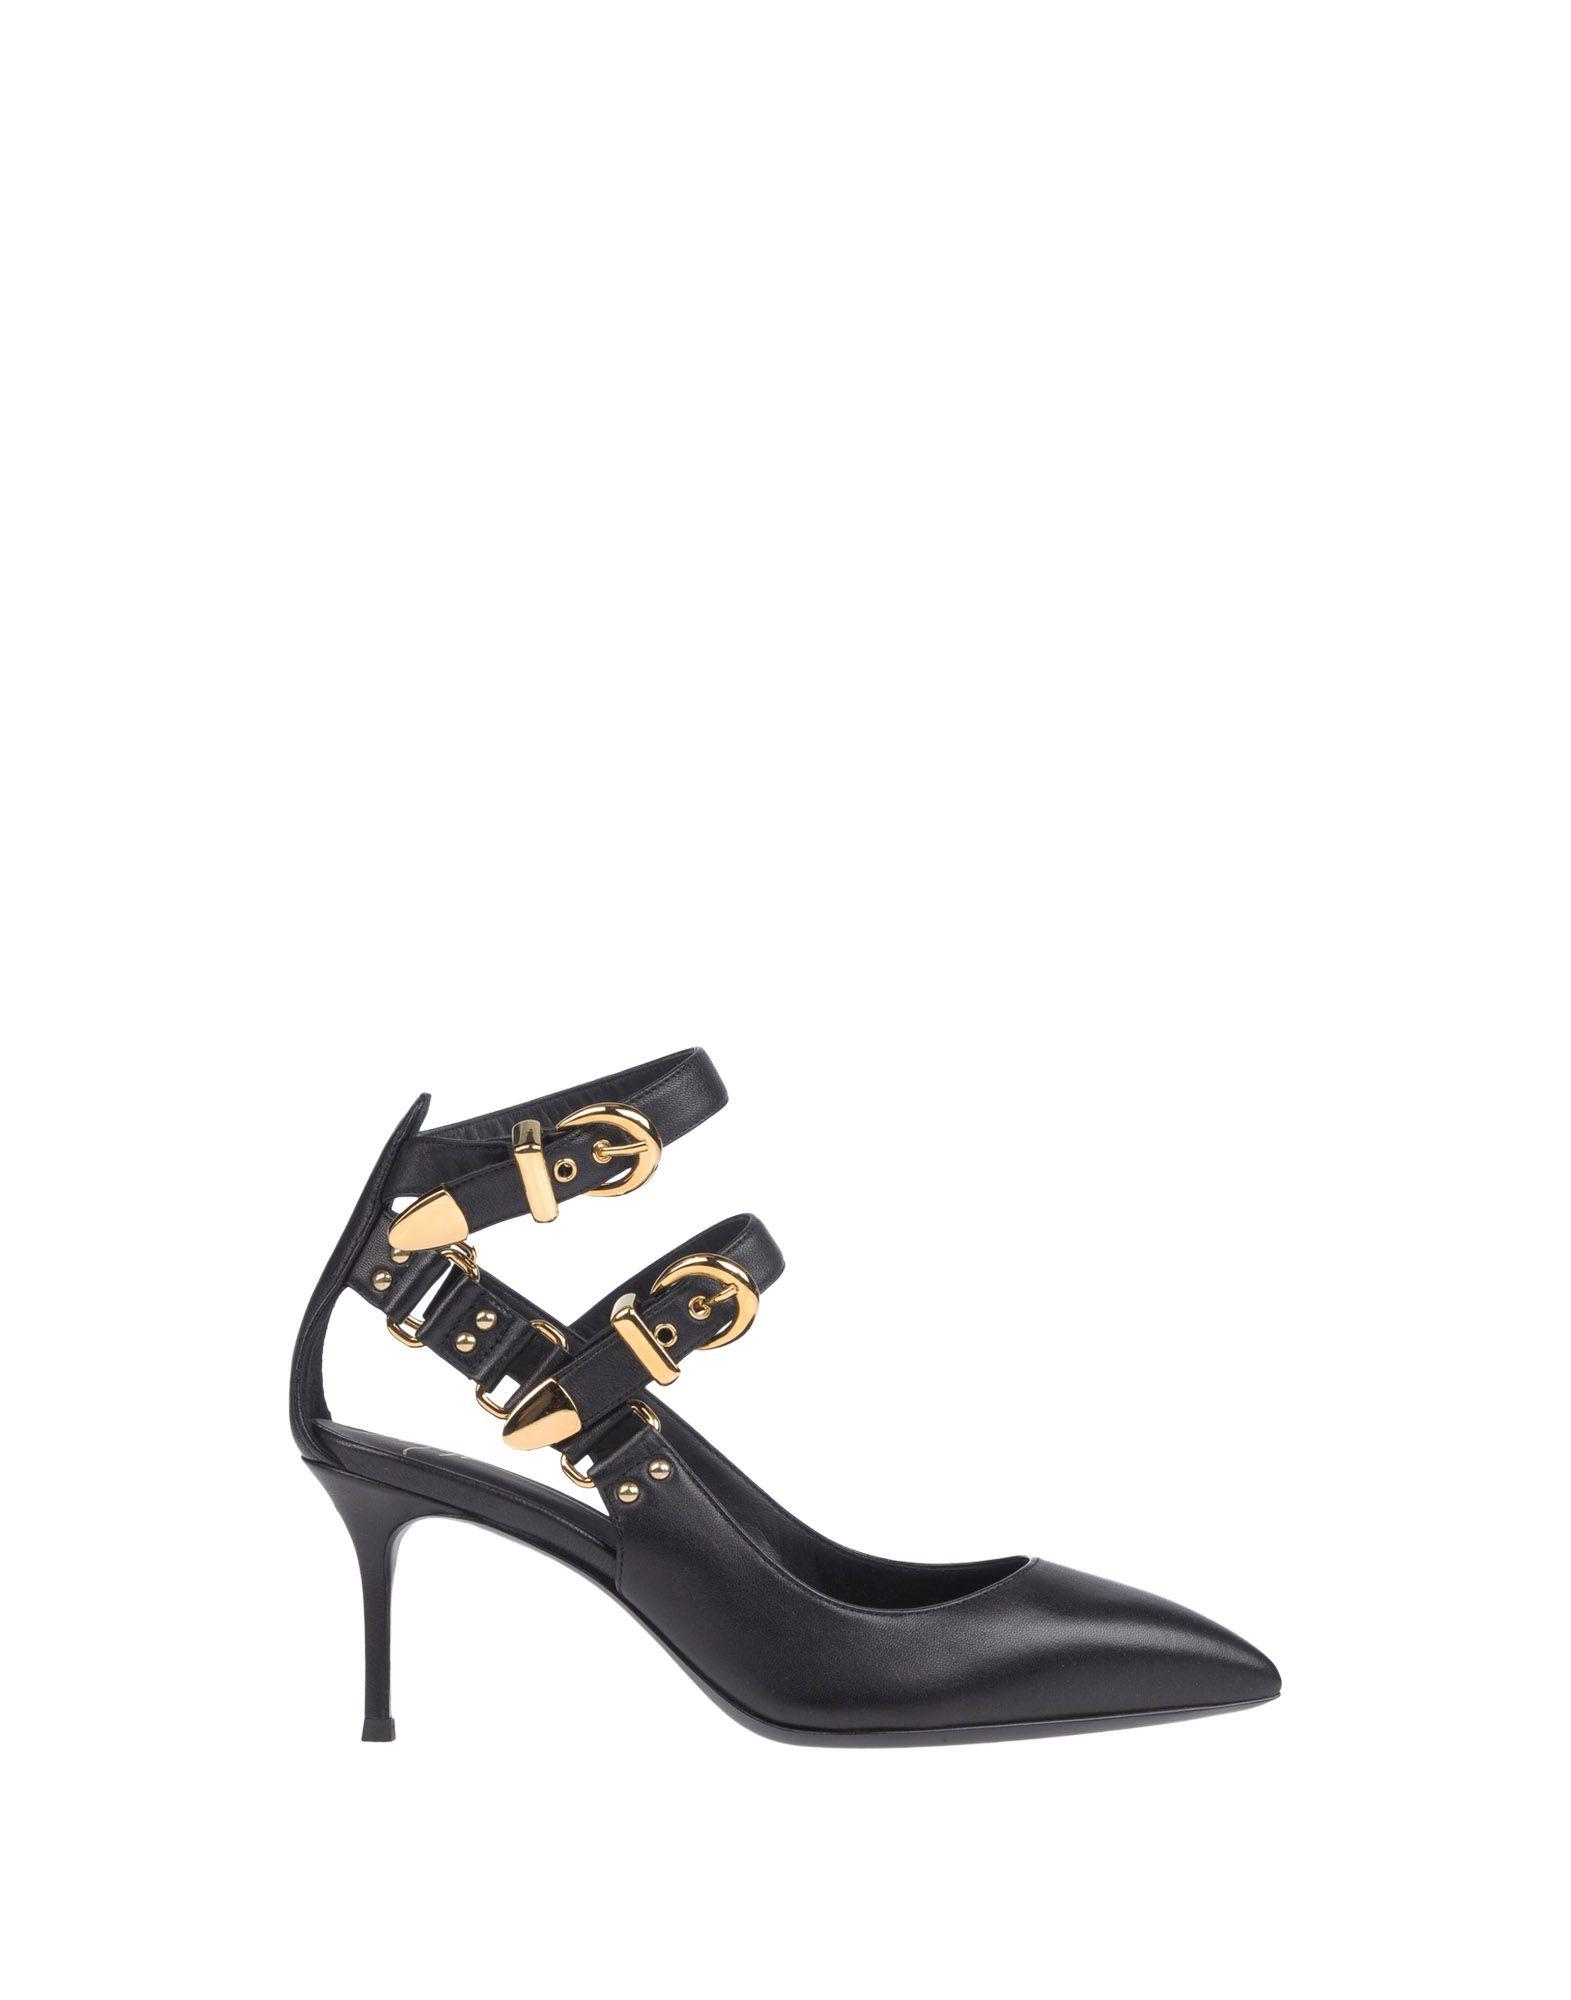 Giuseppe Damen Zanotti Pumps Damen Giuseppe  11241078MI Beliebte Schuhe 1f893b